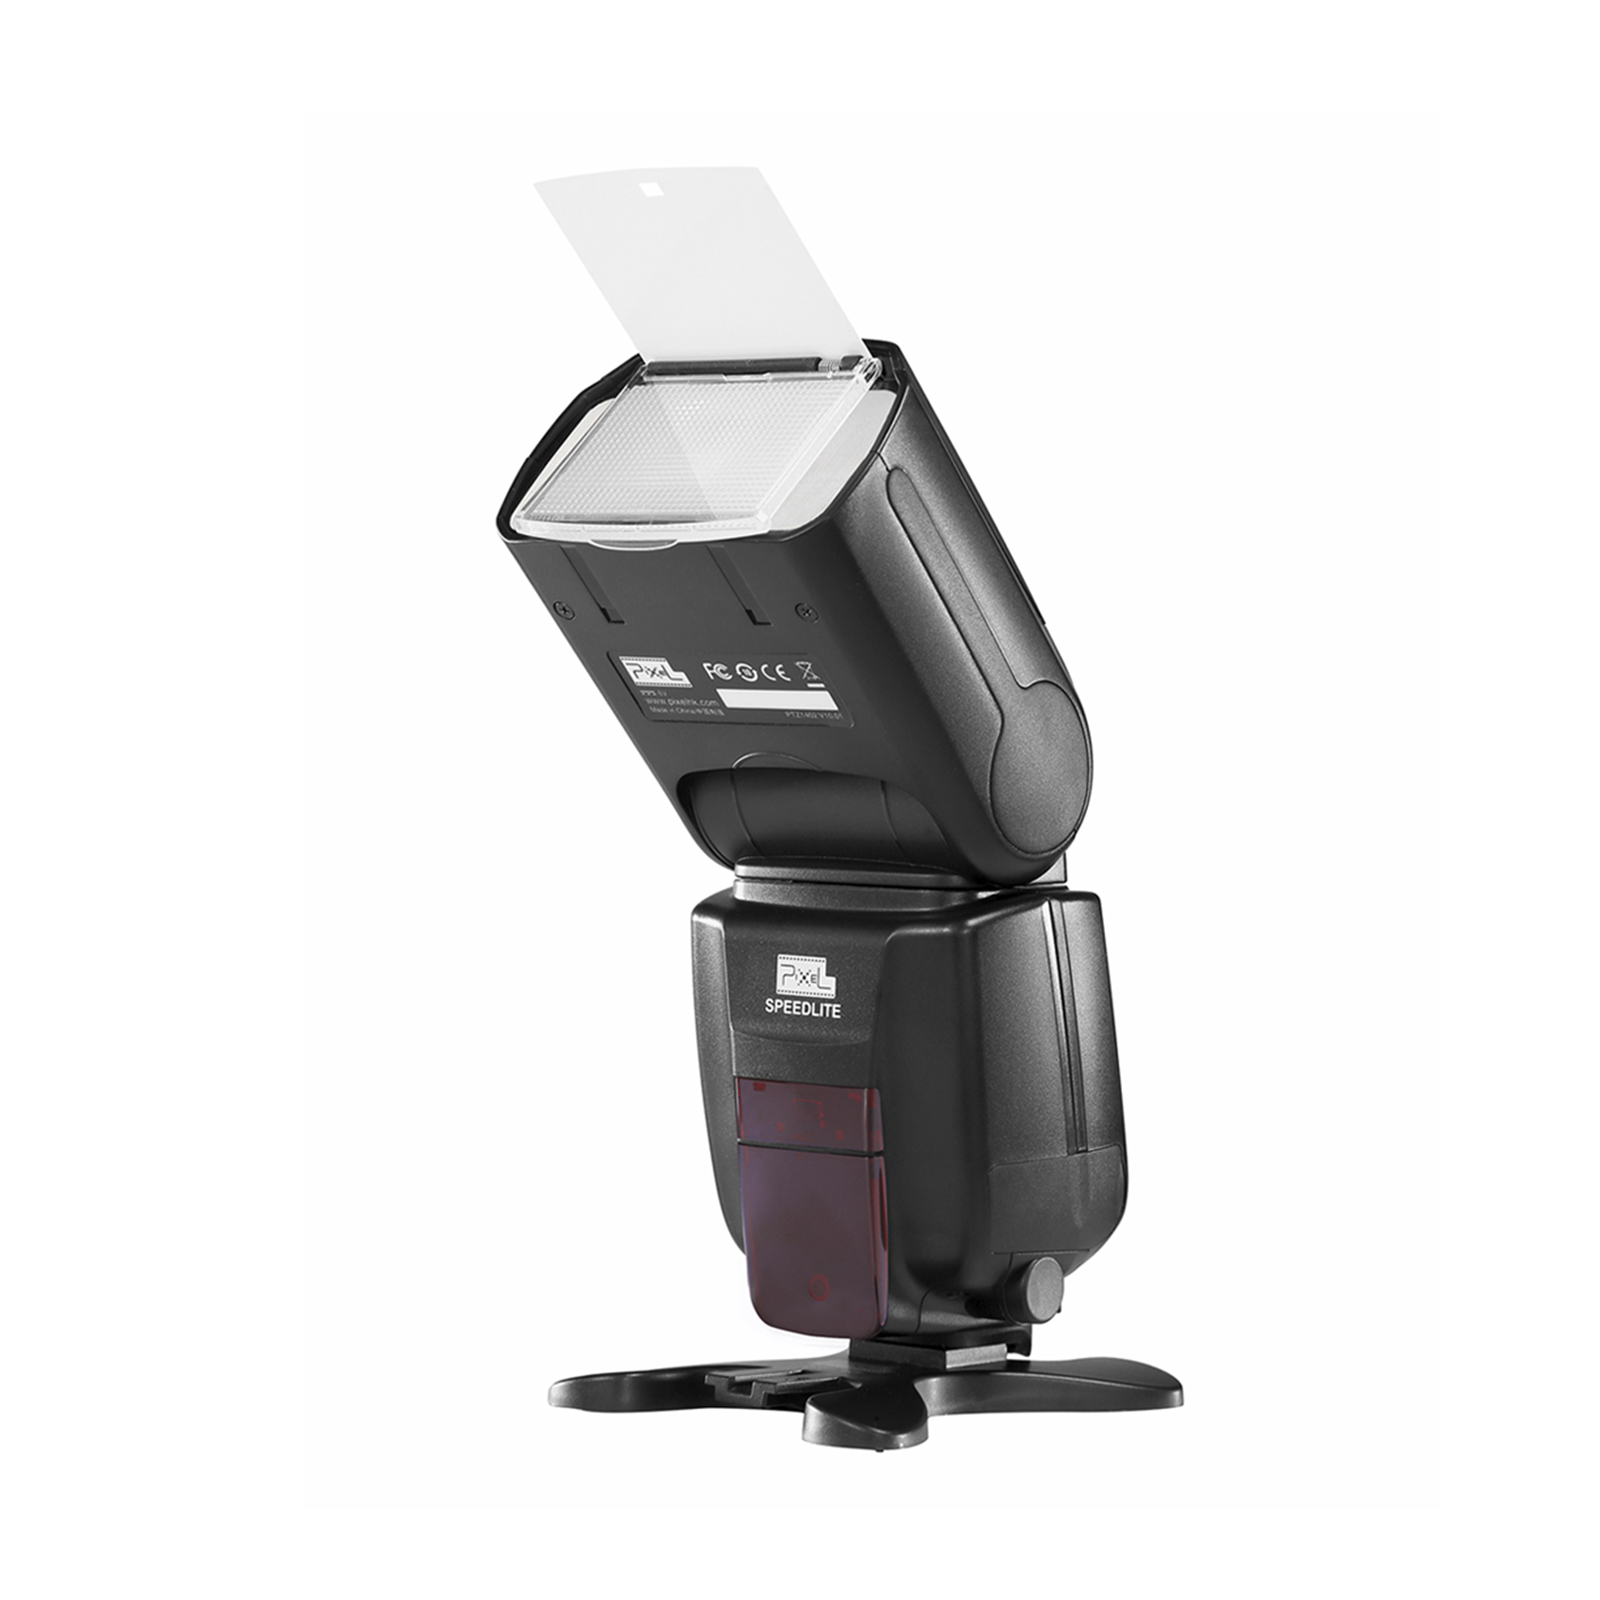 Pixel x800n standard speedlite for Nikon, high speed synchronization and powerful performance.